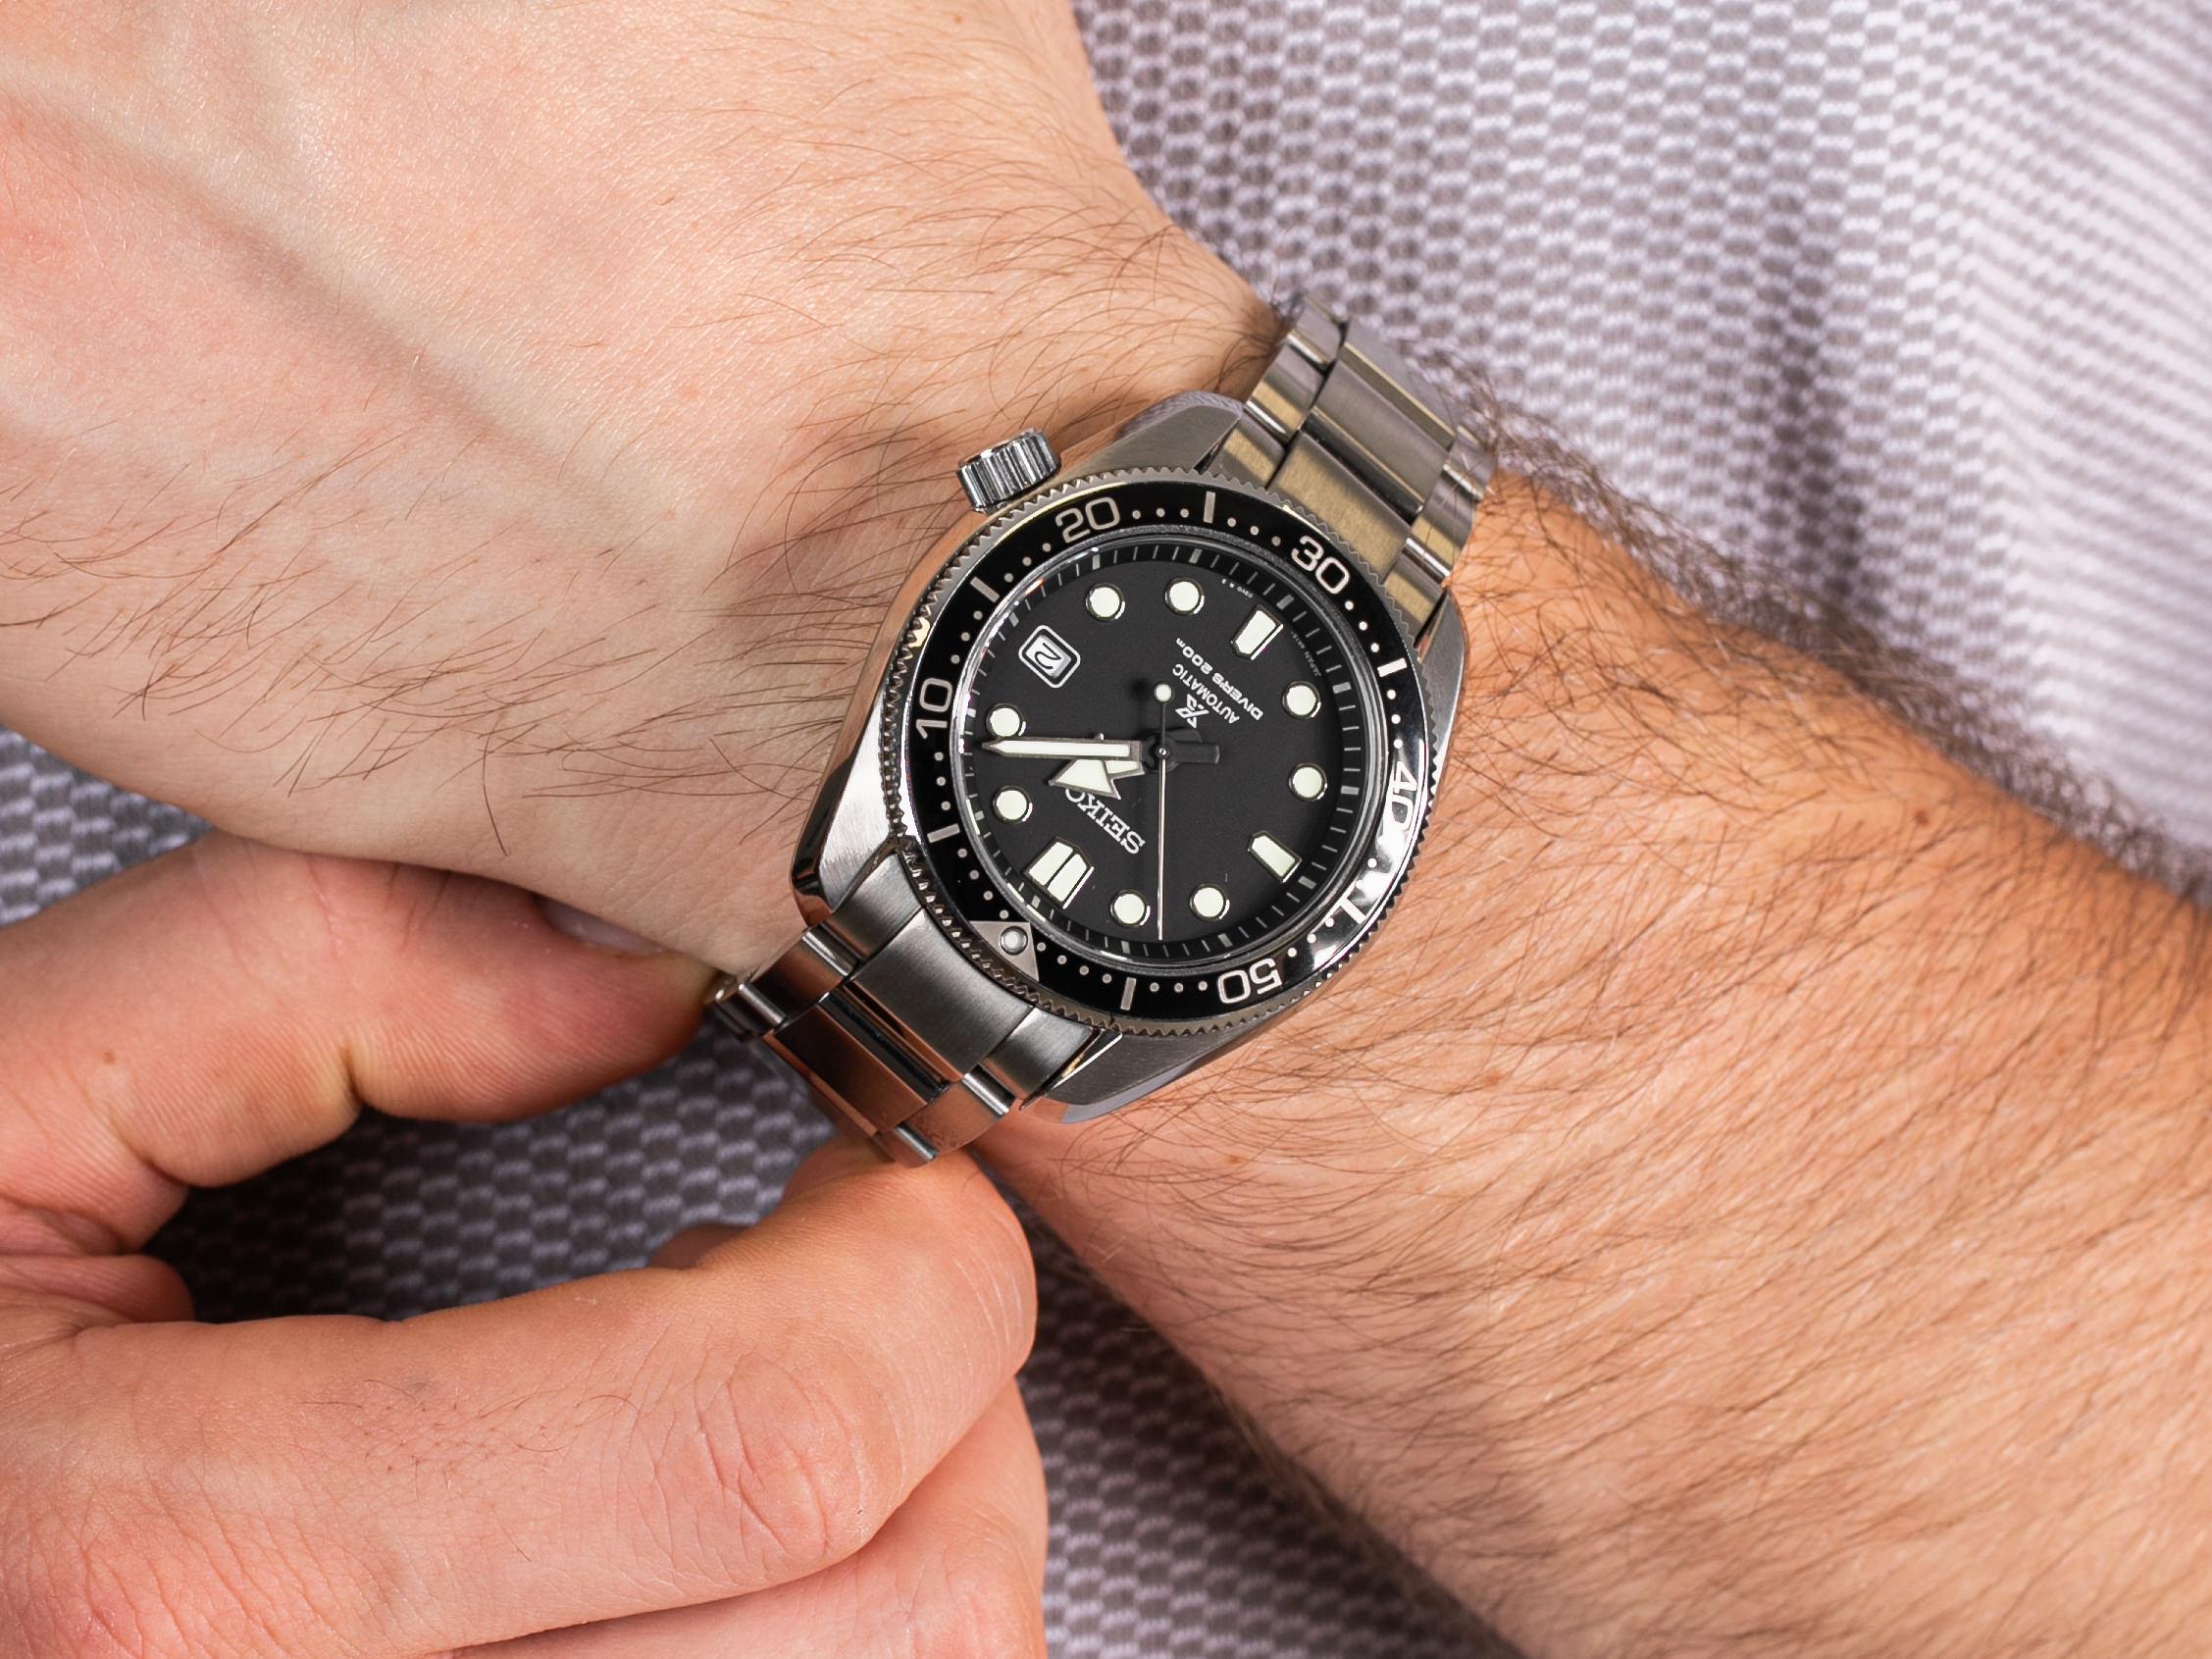 Seiko SPB077J1 Prospex 1968 Divers 200m Automatic zegarek klasyczny Prospex